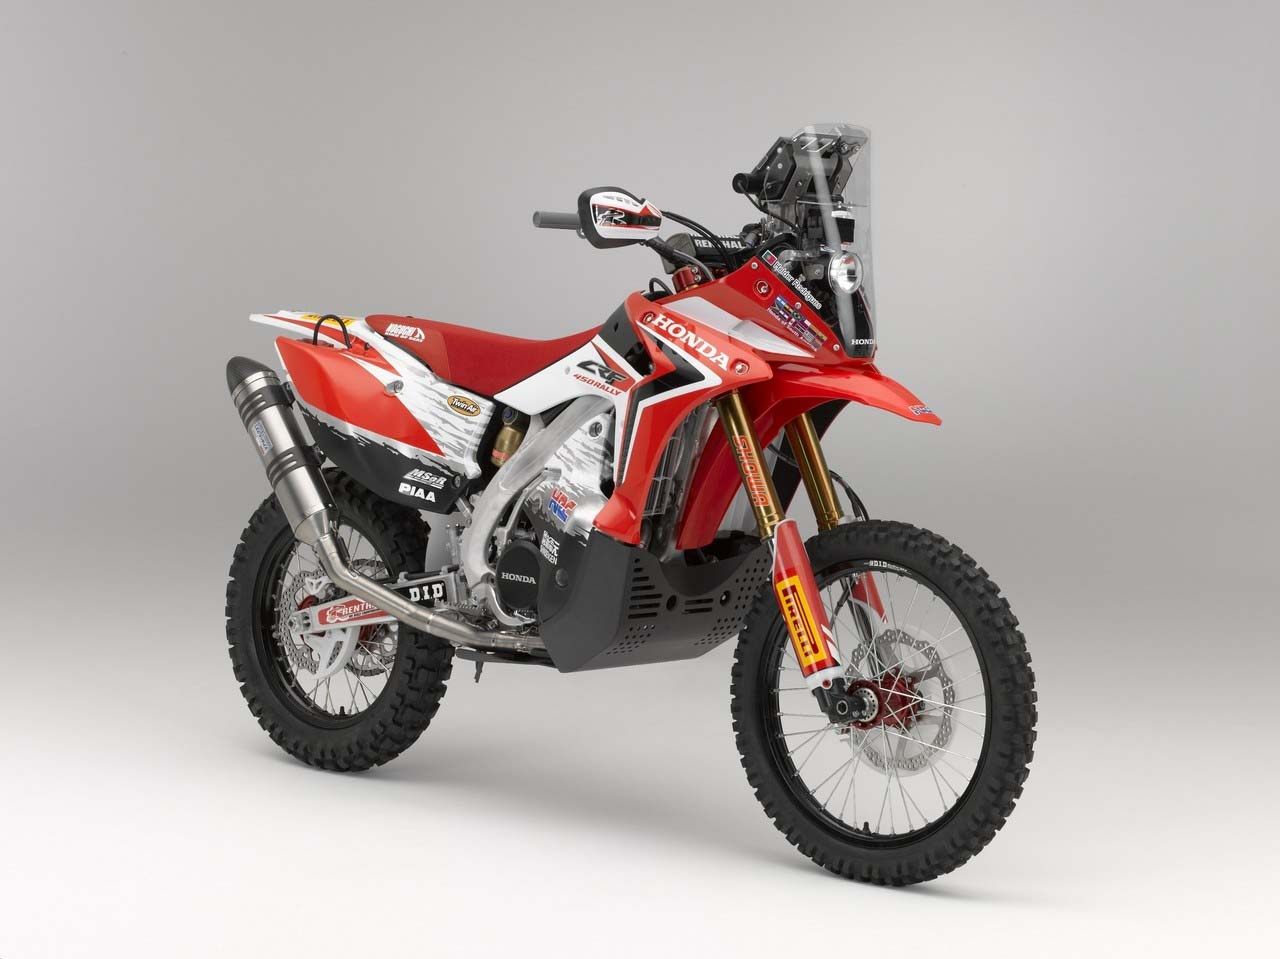 2013 Honda Crf450 Rally Big Red Is Ready For Dakar Asphalt Amp Rubber